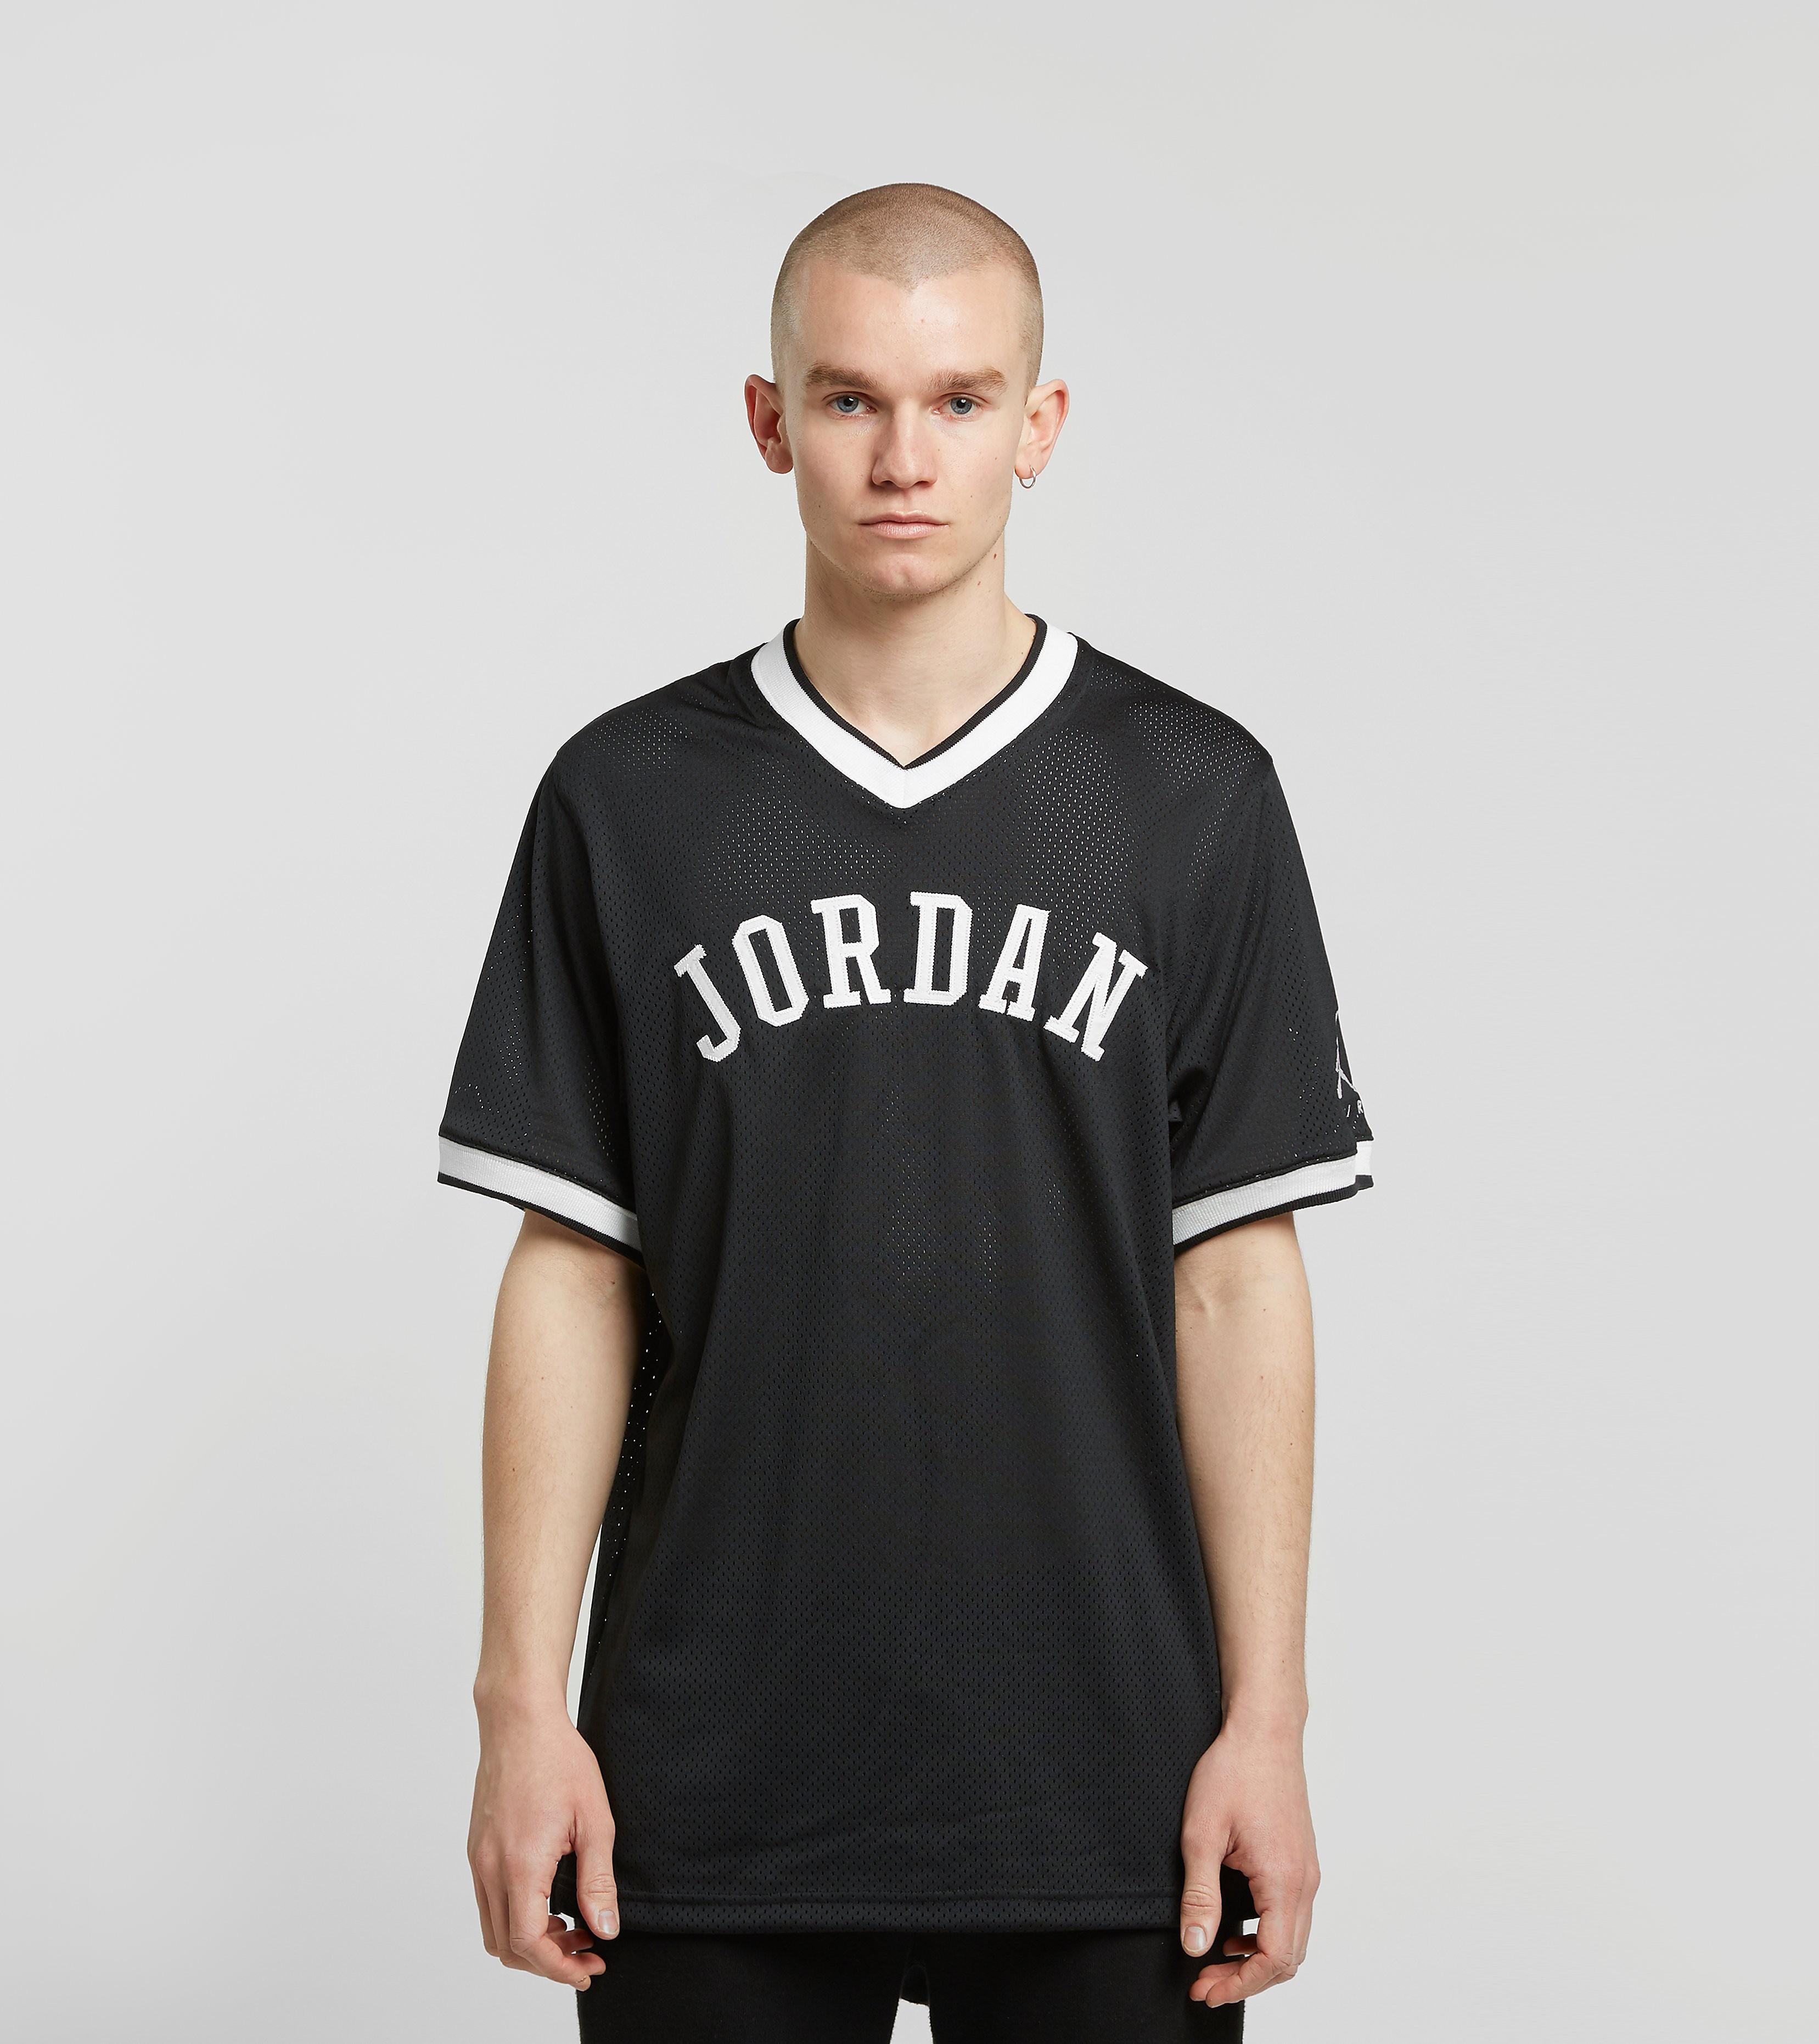 Jordan Mesh Jersey